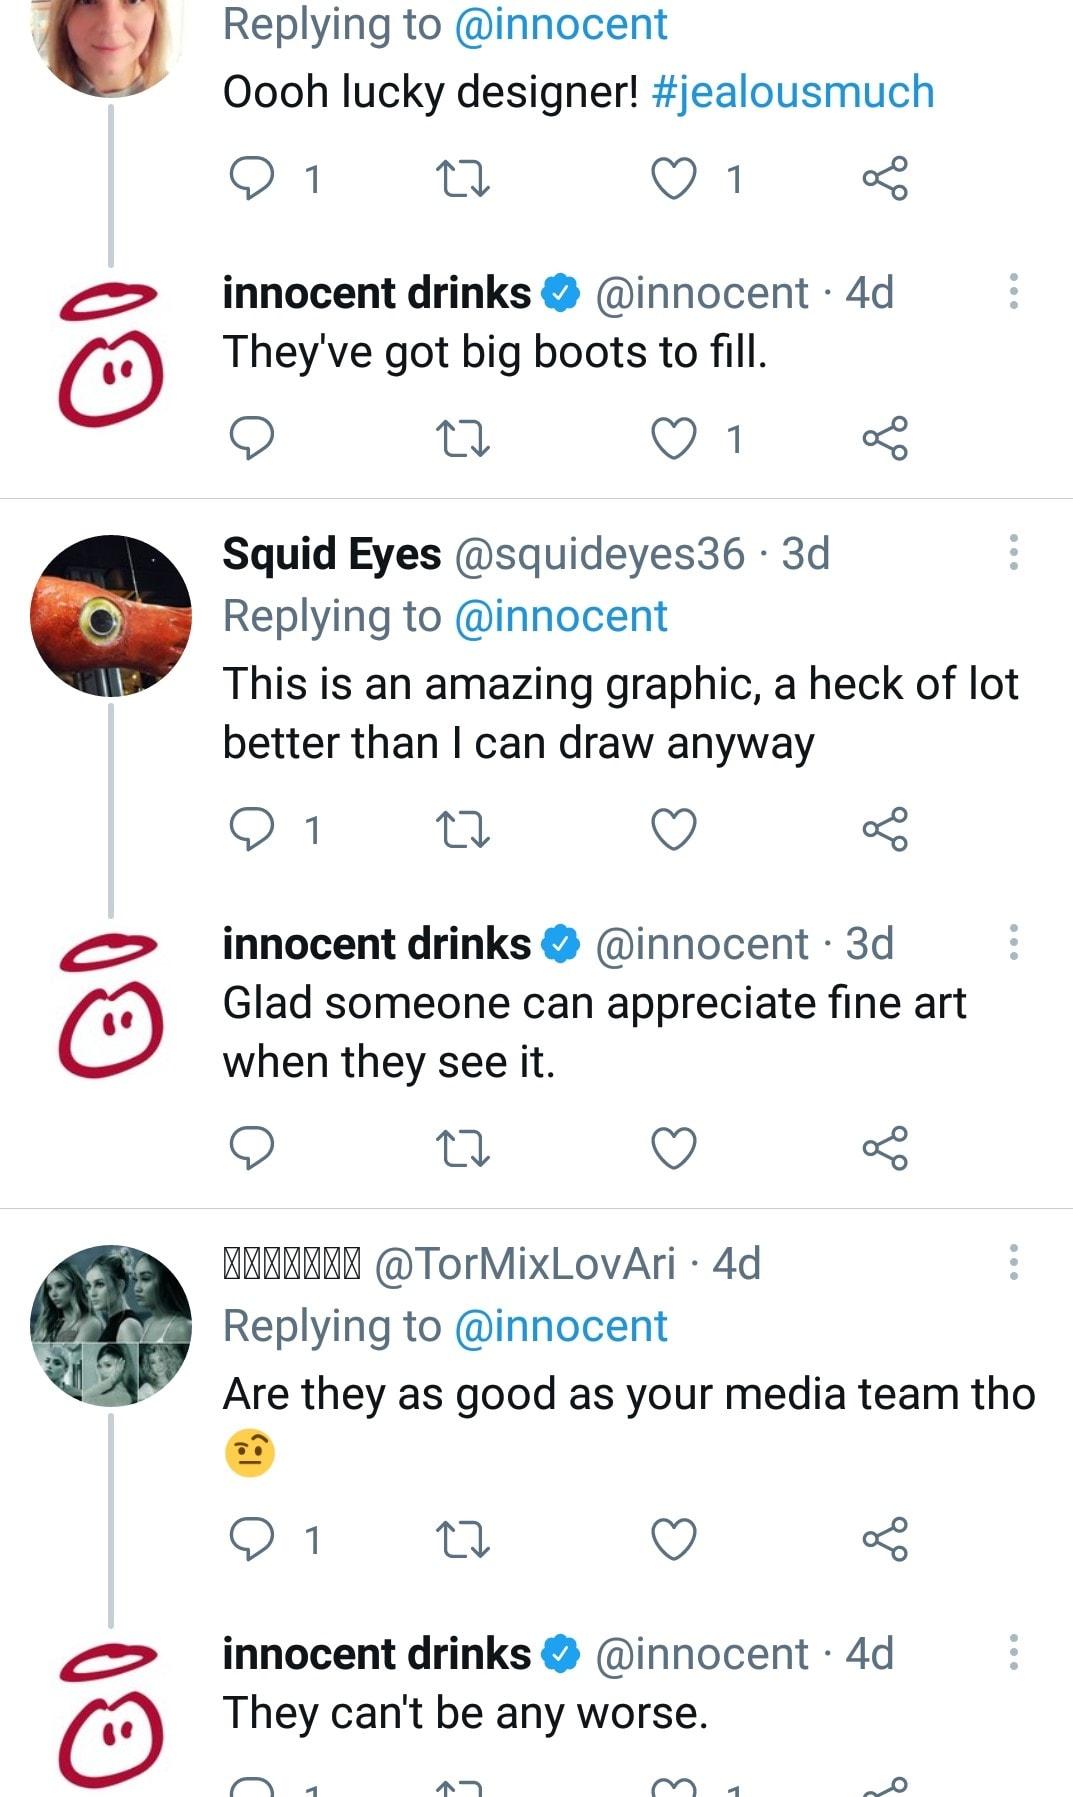 Twitter conversation from Innocent